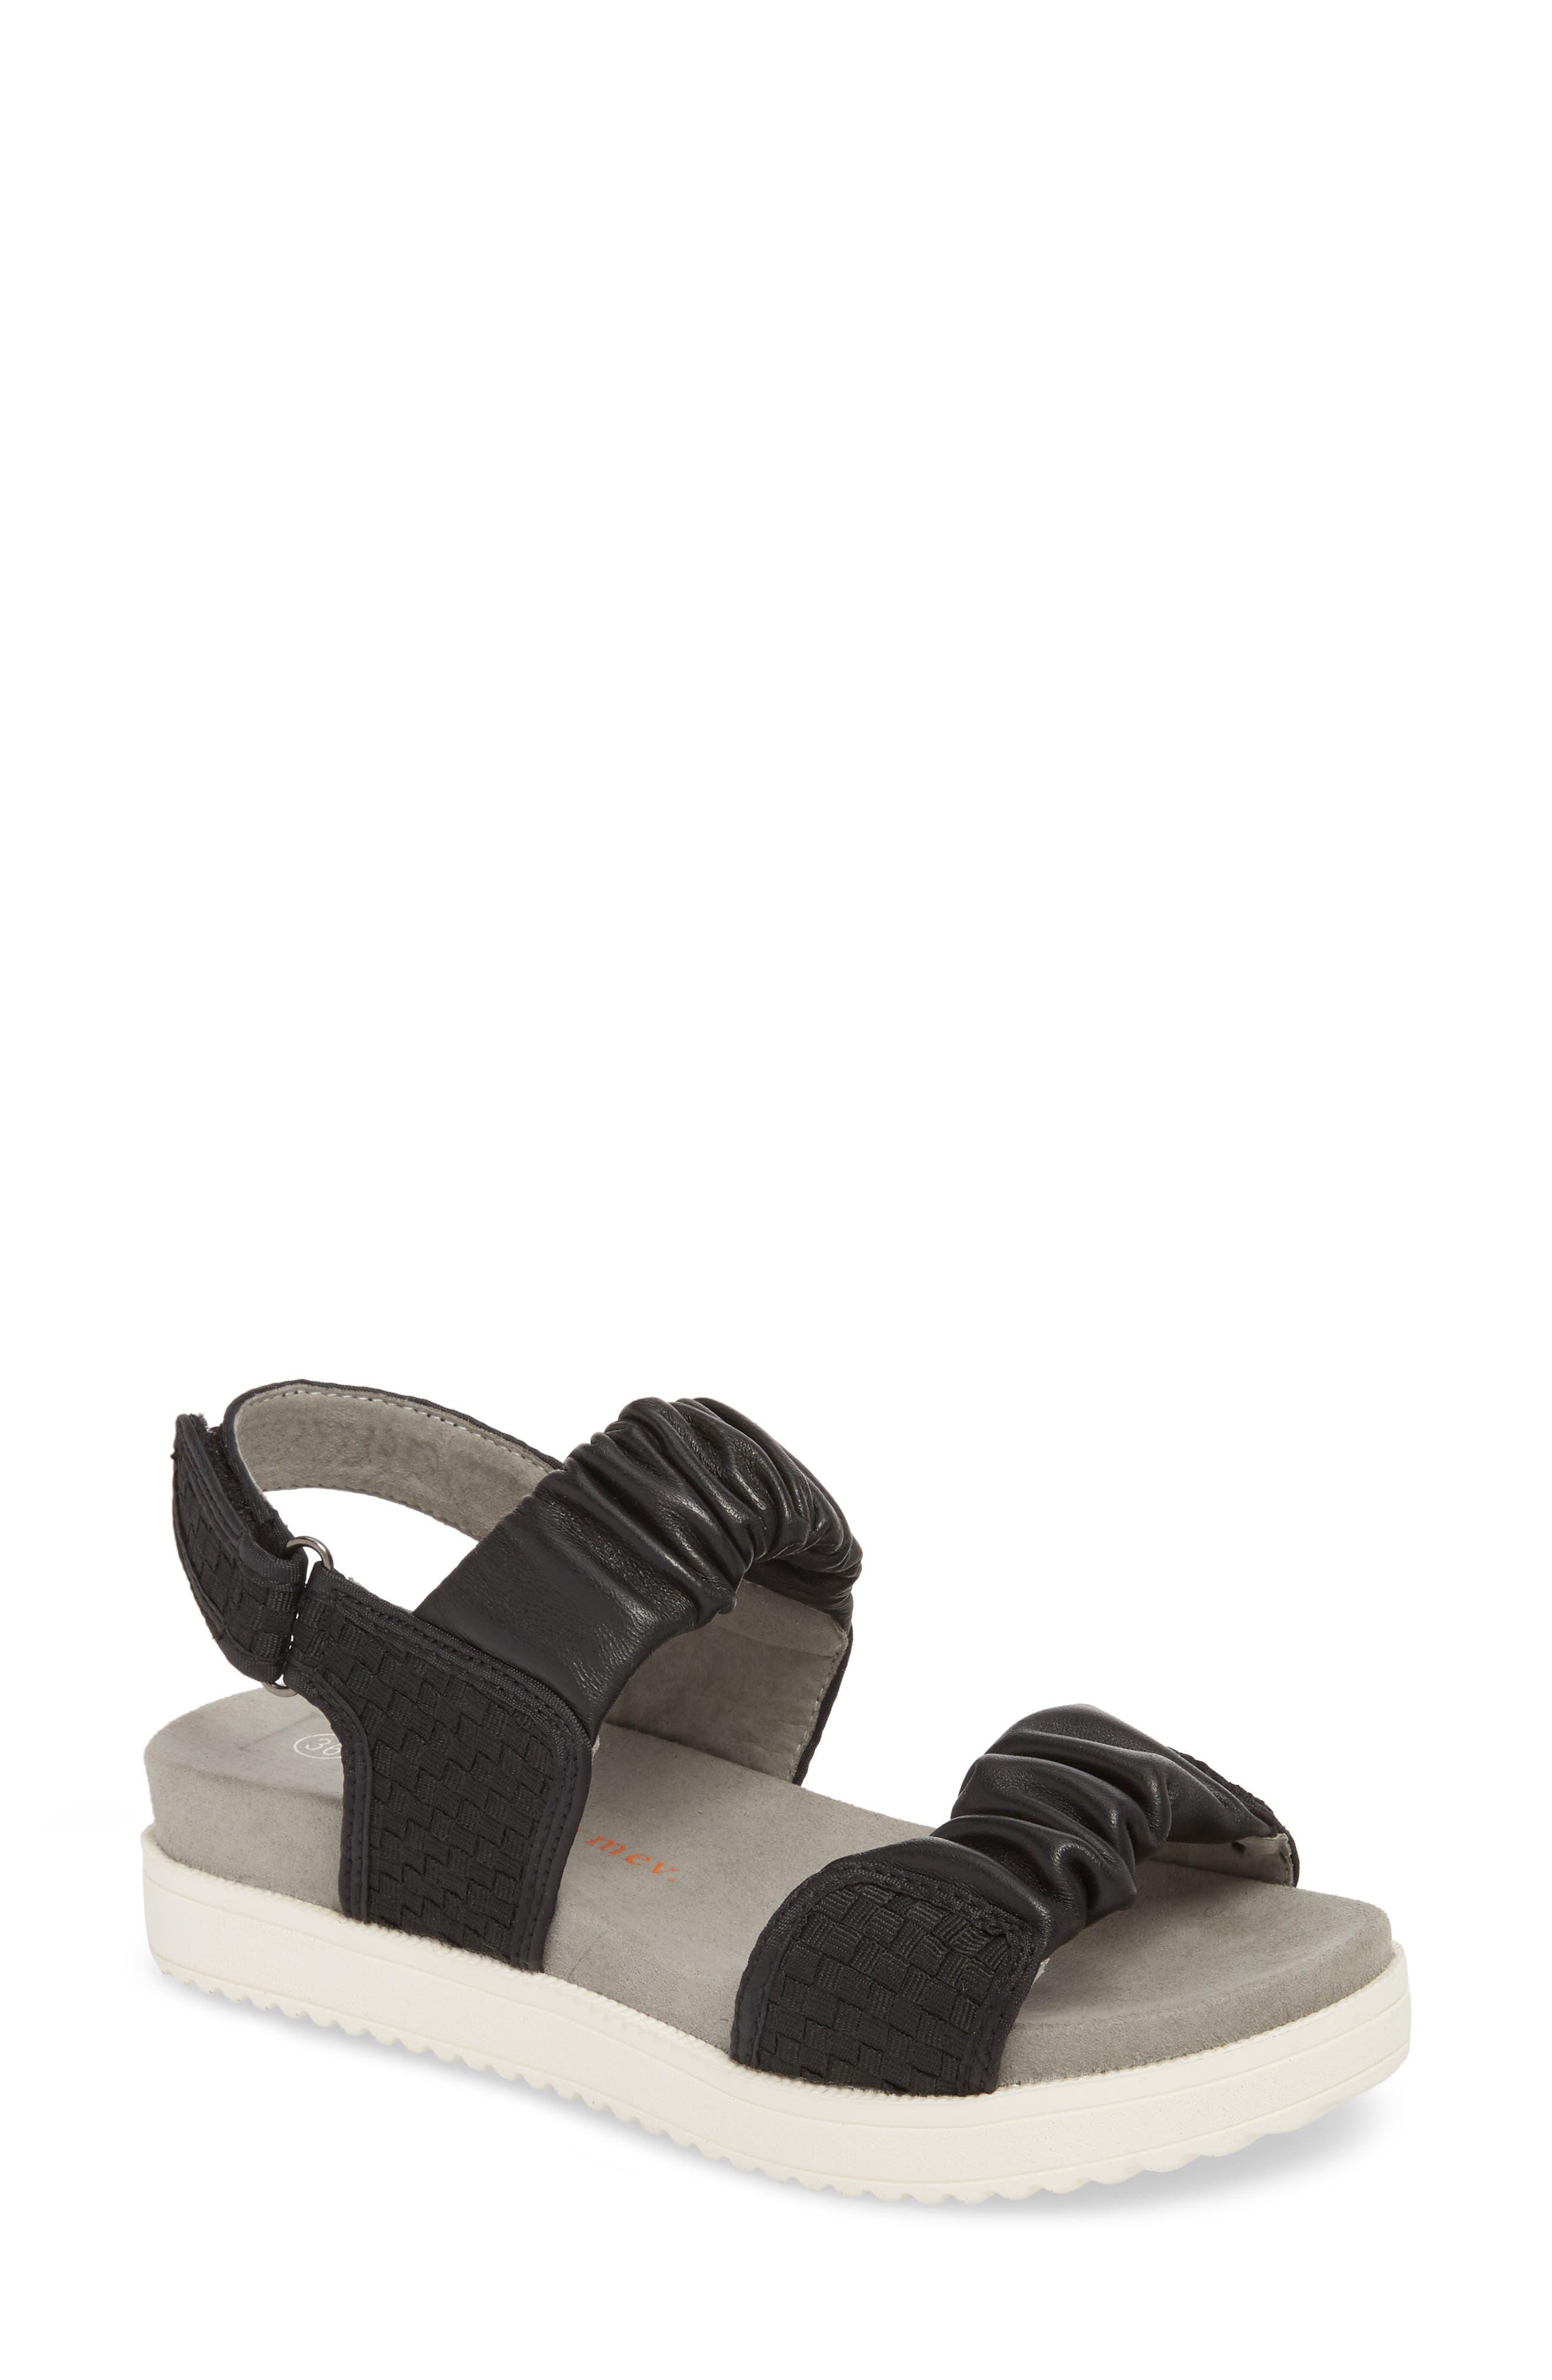 Fiji Sandal,                         Main,                         color, BLACK/ BLACK LEATHER